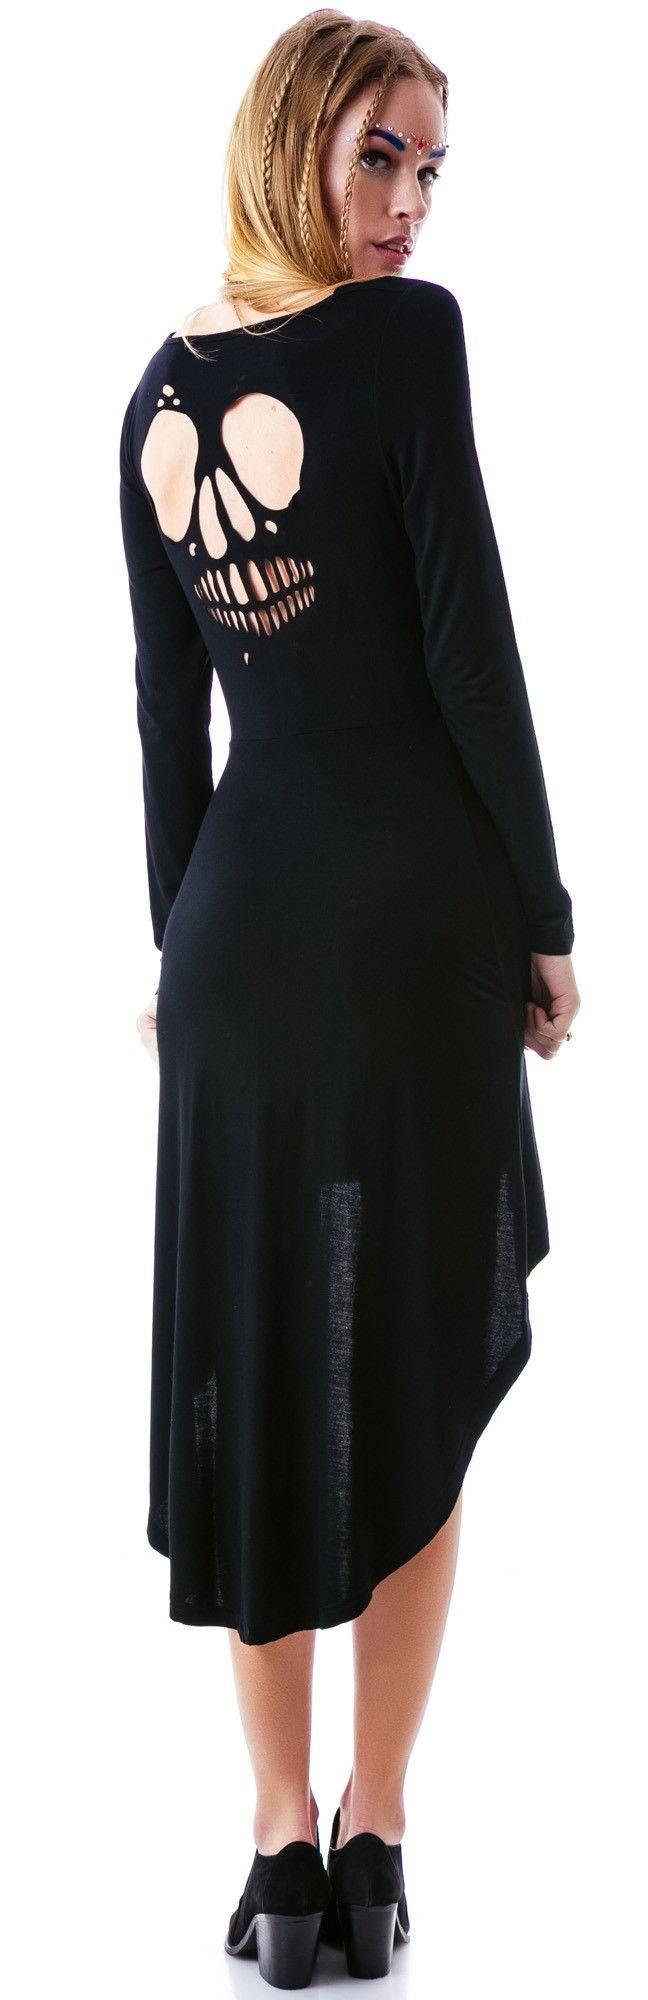 ✝☮✿★ SKULL CUTOUT DRESS ✝☯★☮ Sourpuss Clothing Skull Cutout Hi/Low Dress   Dolls Kill